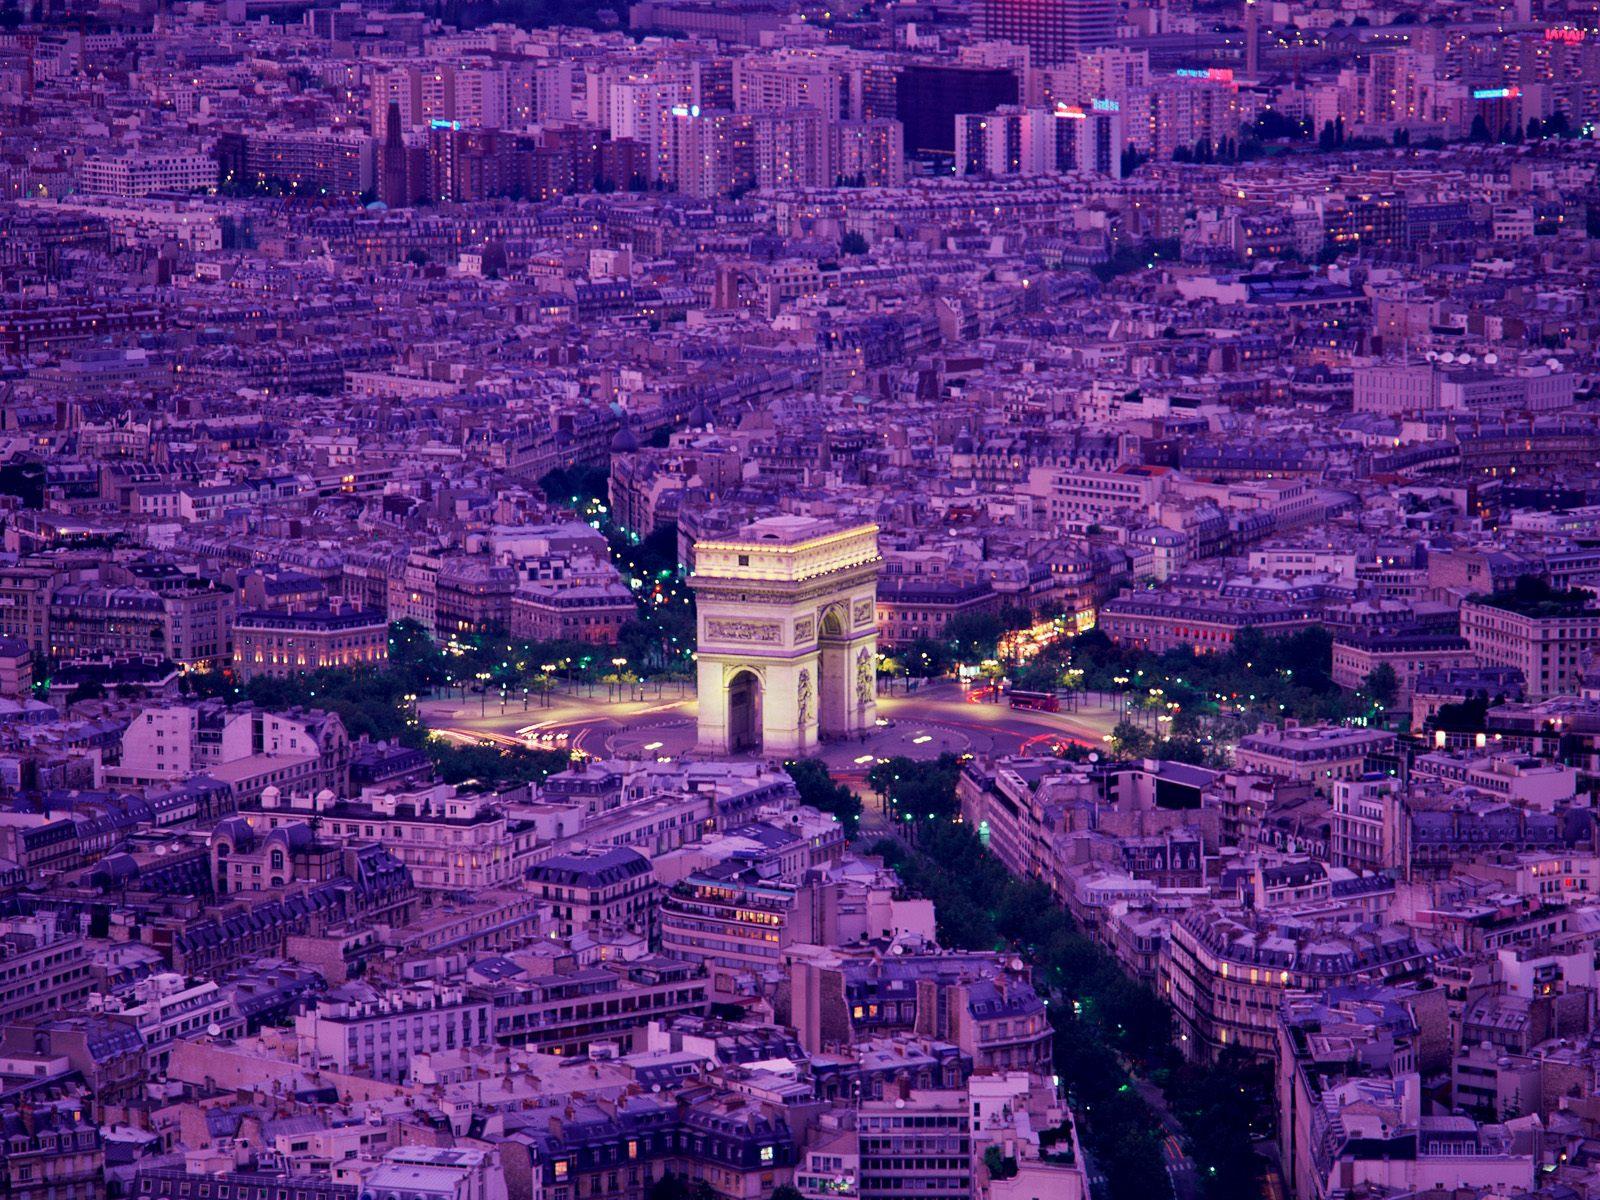 http://4.bp.blogspot.com/-GnhMv8D-lkQ/TVPvLRJ4ULI/AAAAAAAAB3w/DQ_AAkTE-ME/s1600/Arc+de+Triomphe%252C+Paris%252C+France.jpg